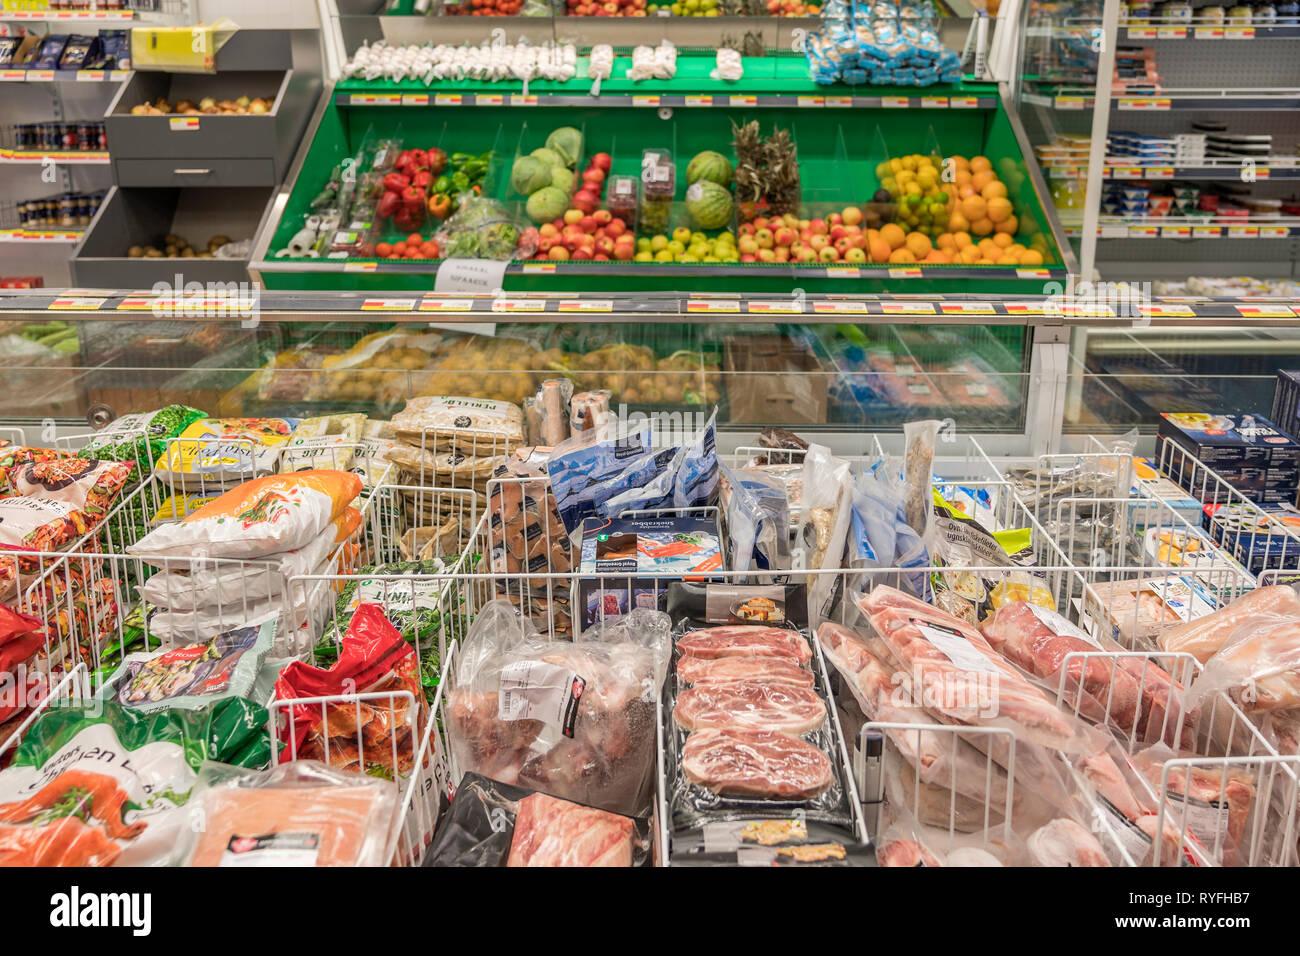 Convenience Store, Narsarsuaq, South Greenland - Stock Image